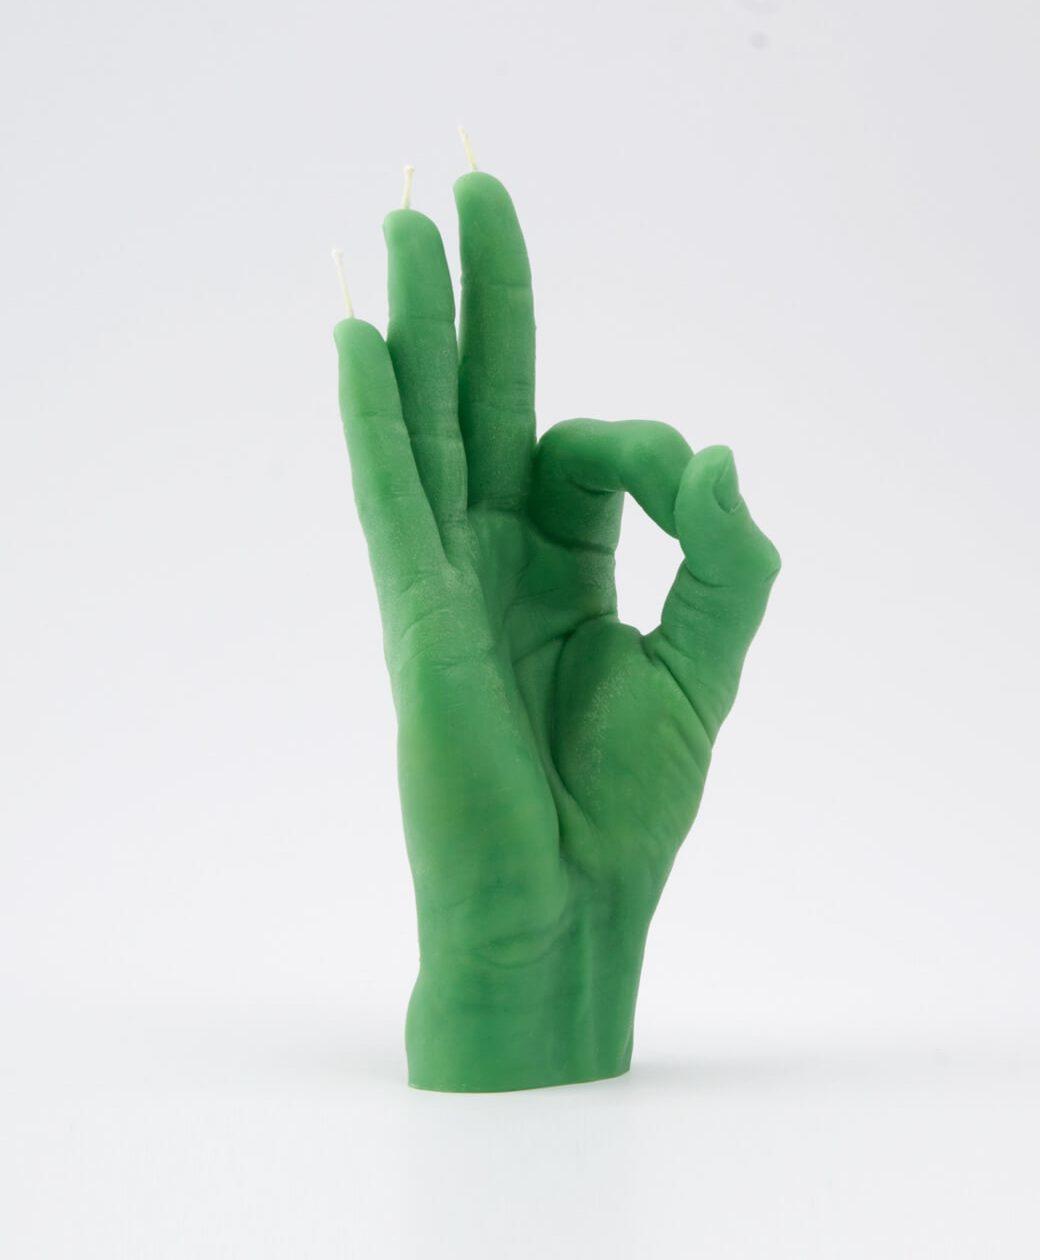 Ok green 2 1040x1260 2